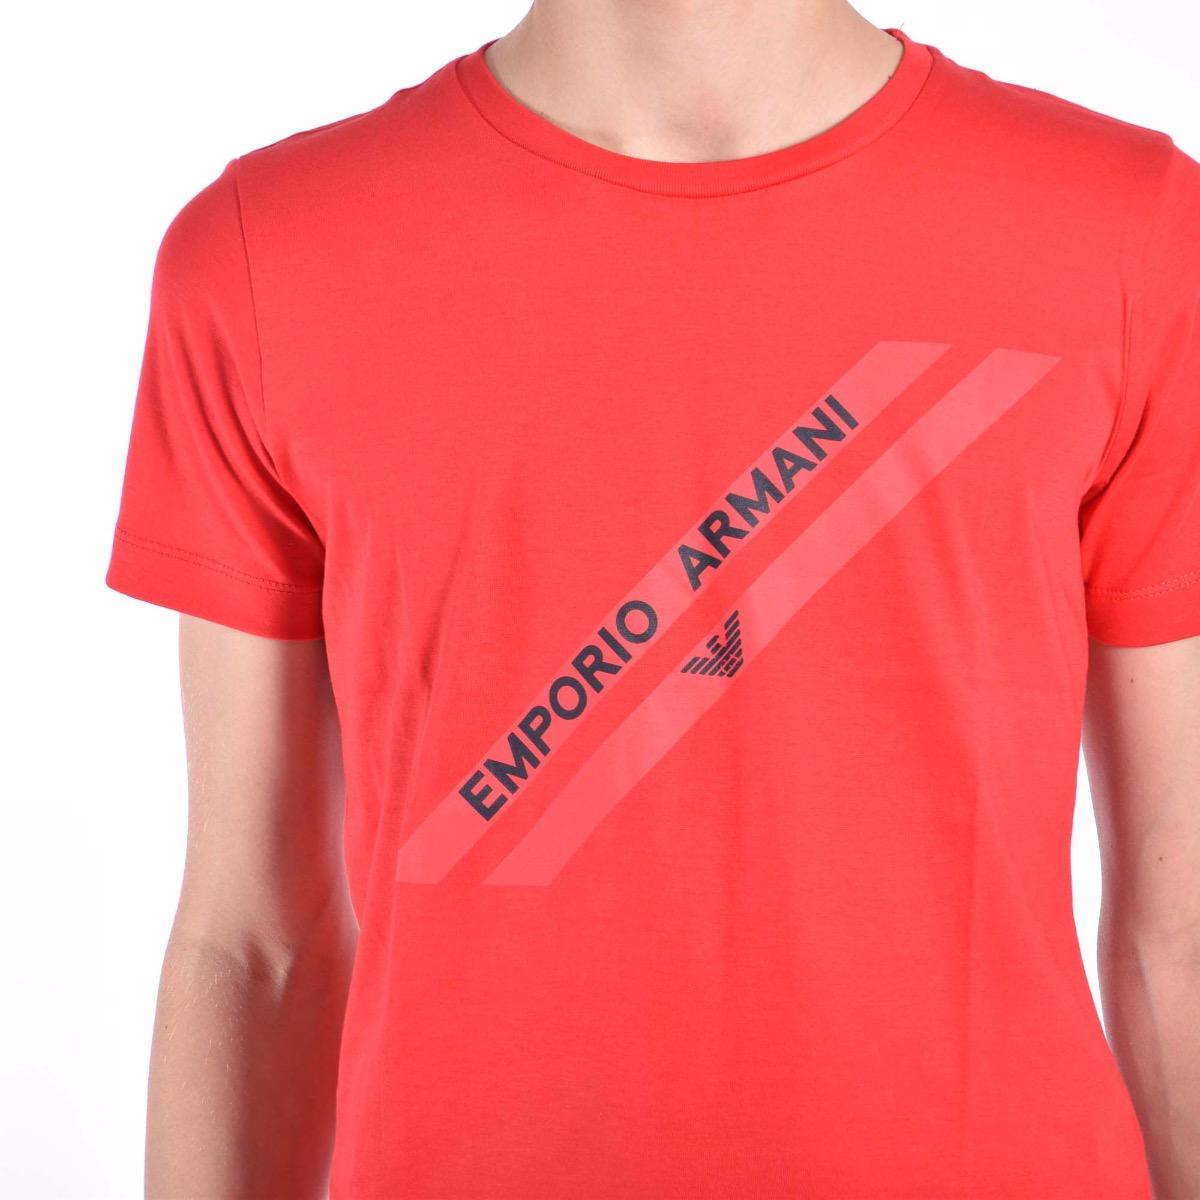 T-shirt fascia con logo - Rossa